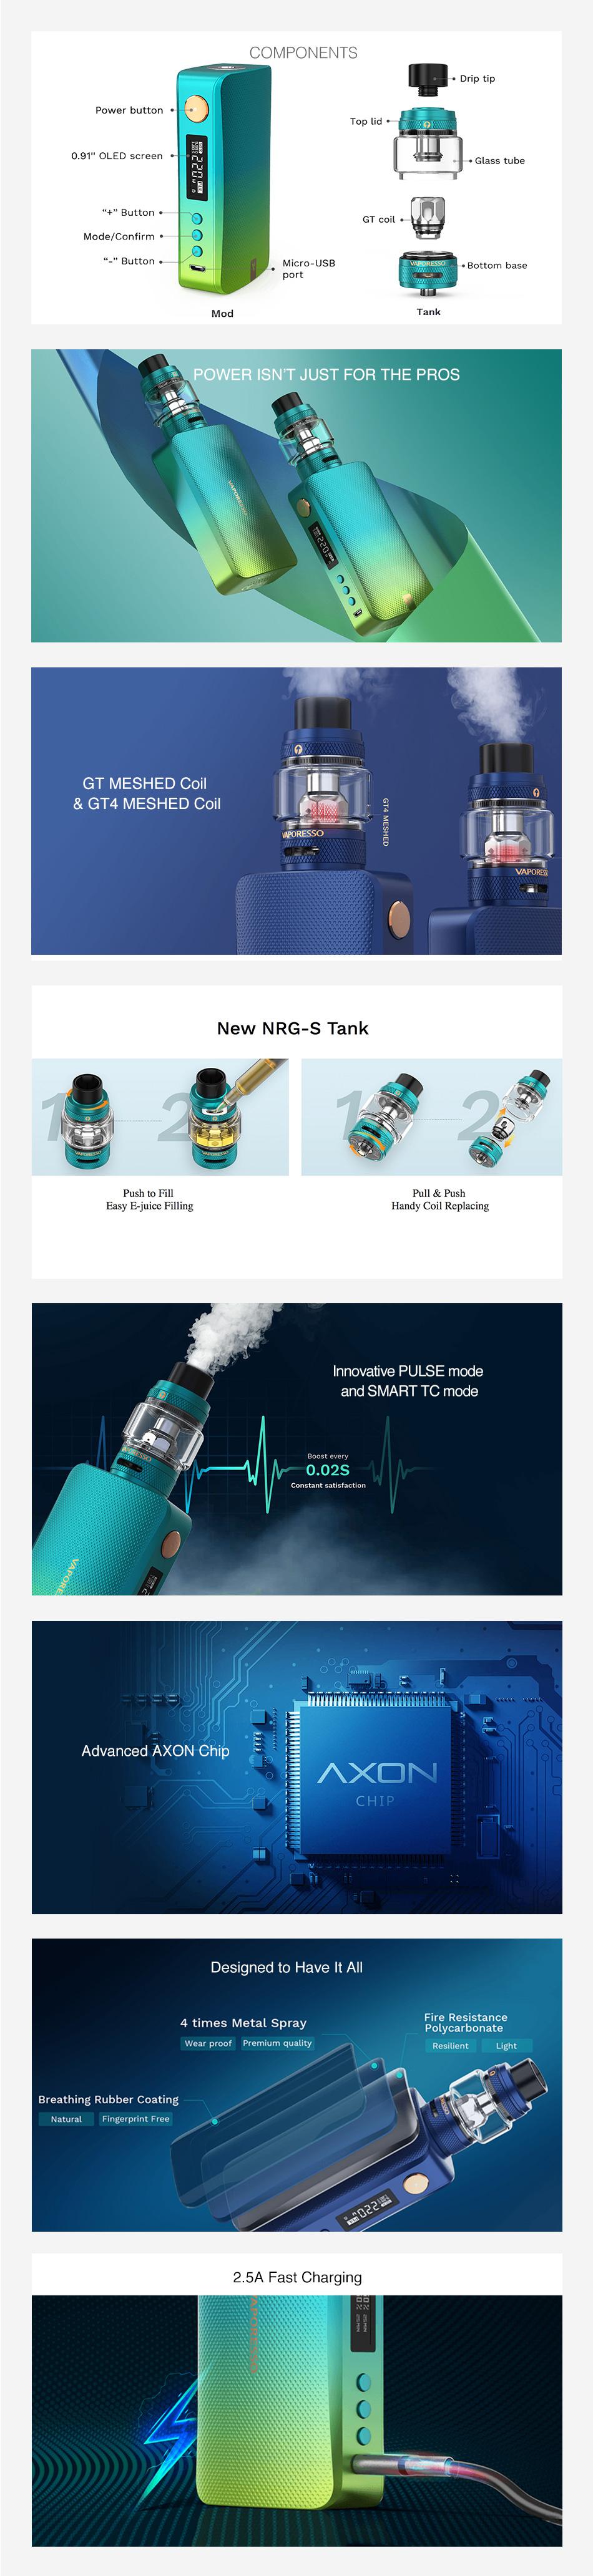 vaporesso-gen-s-220w-tc-kit-with-nrg-s-tank-06-809fe8.jpg